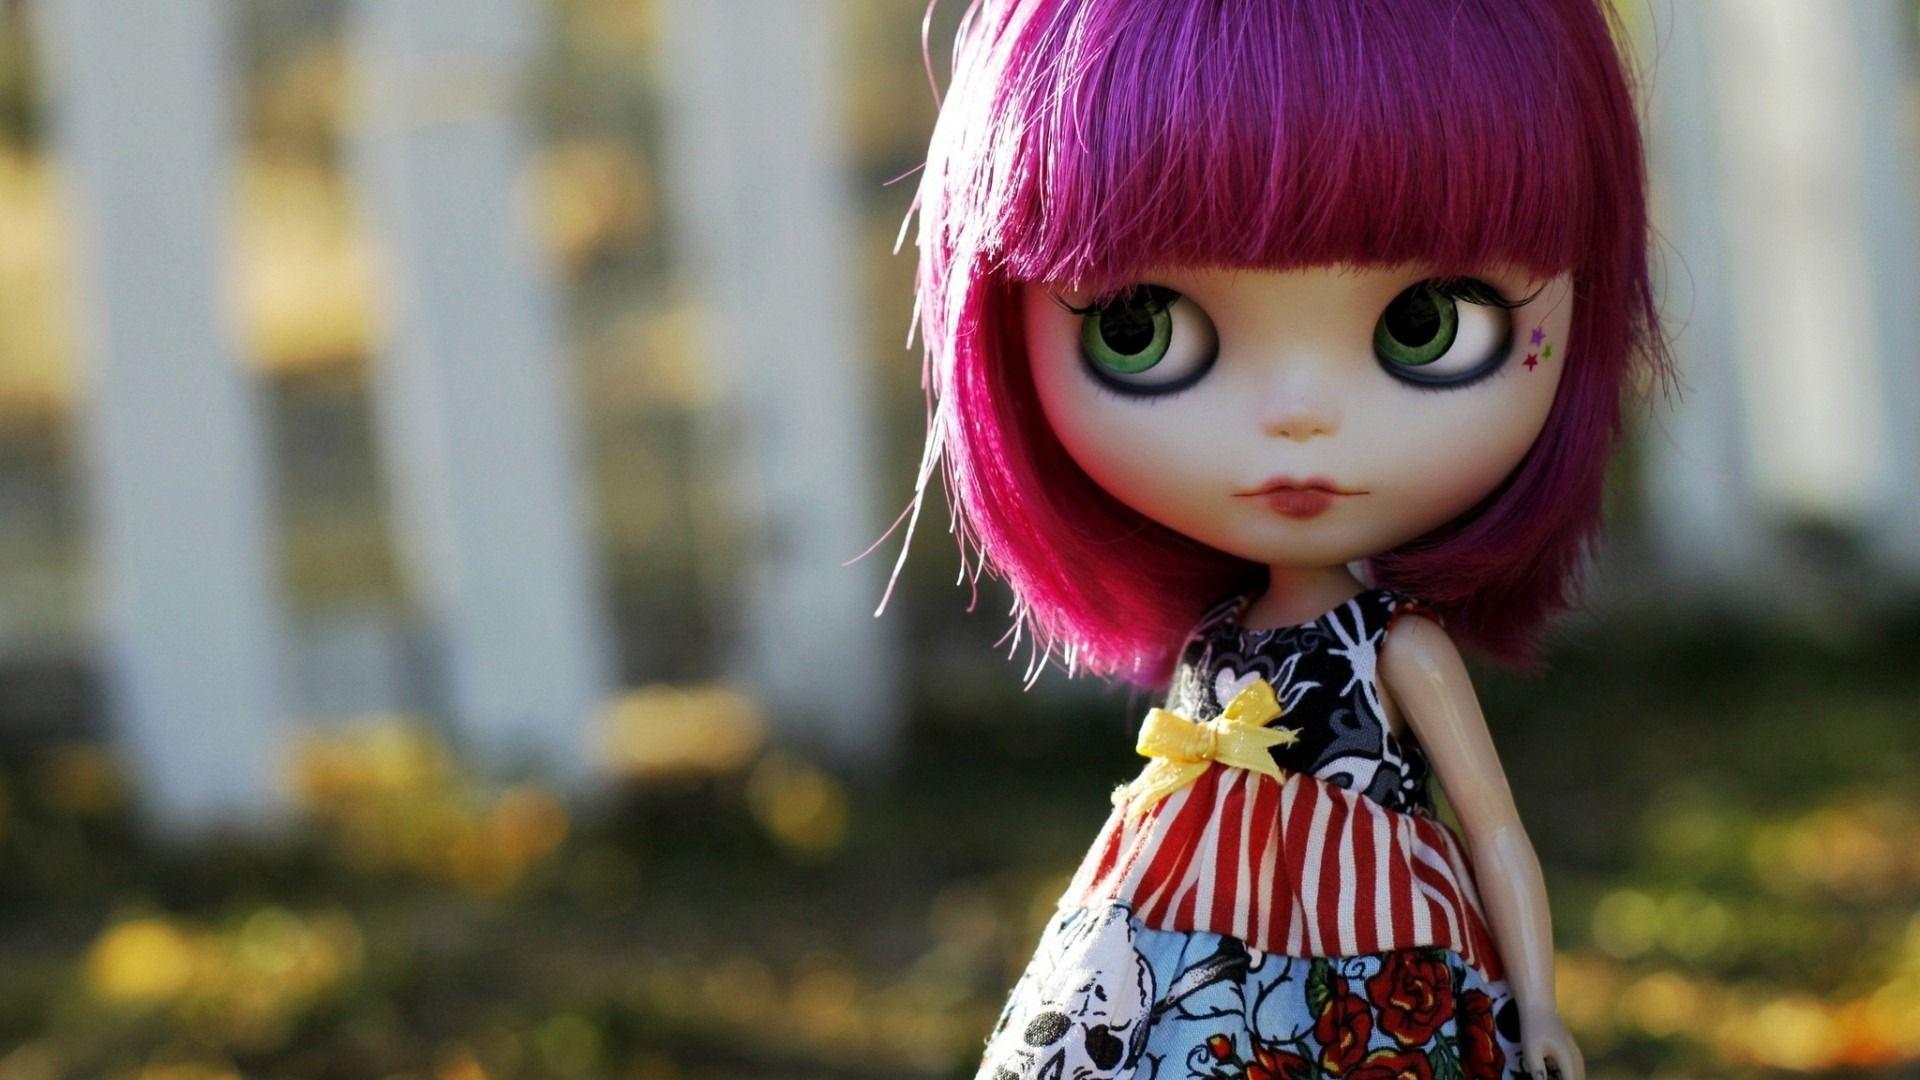 Doll Mauve 1080p Hd Lock Screen Wallpaper Doll Images Hd Cute Desktop Wallpaper Cute Dolls